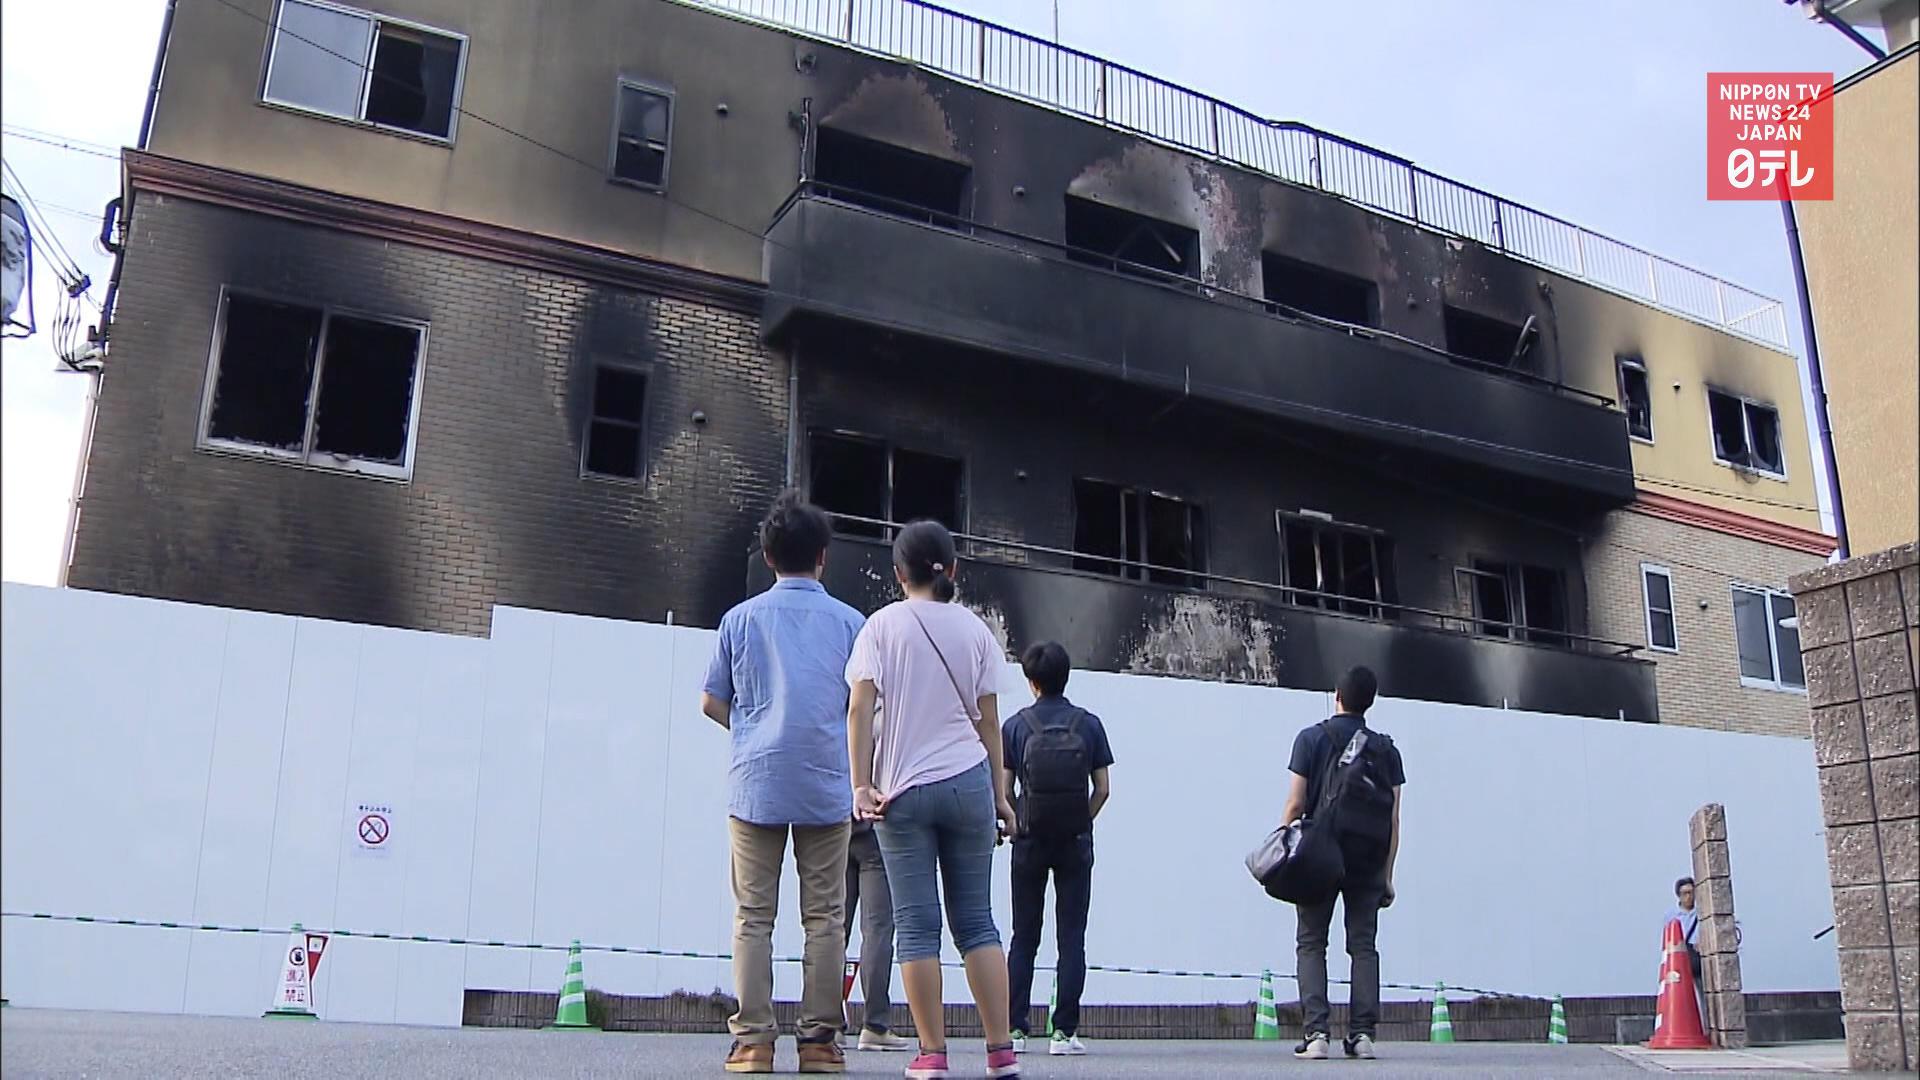 Kyoto Animation fire survivor tells story